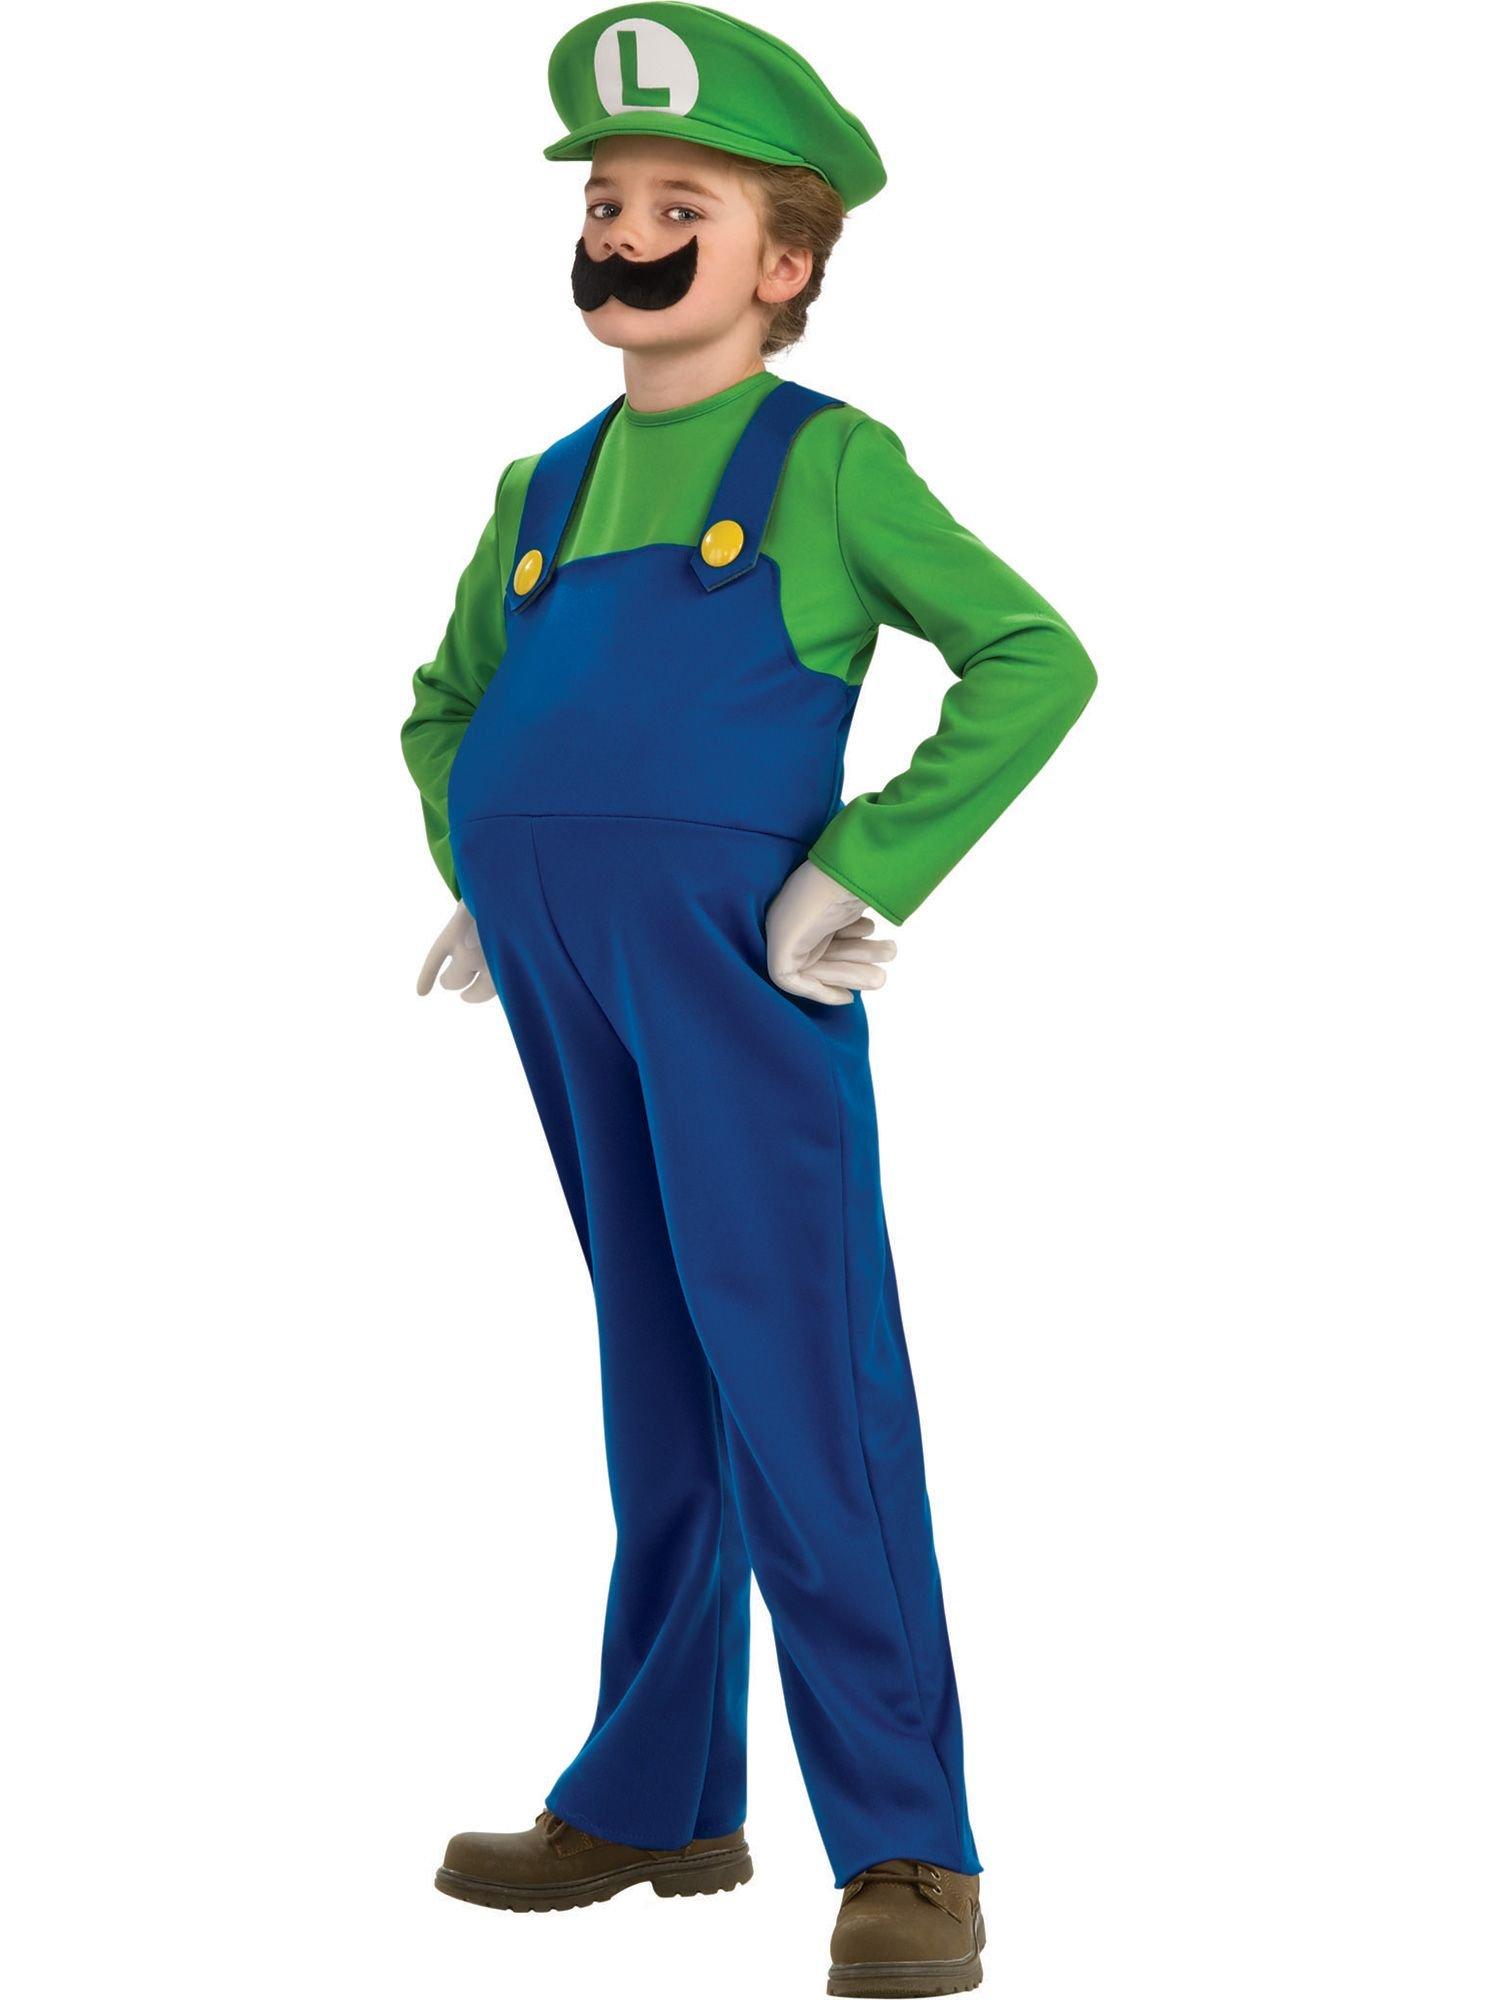 Boy's Nintendo's Super Mario Brothers Luigi Deluxe Costume, 4-6